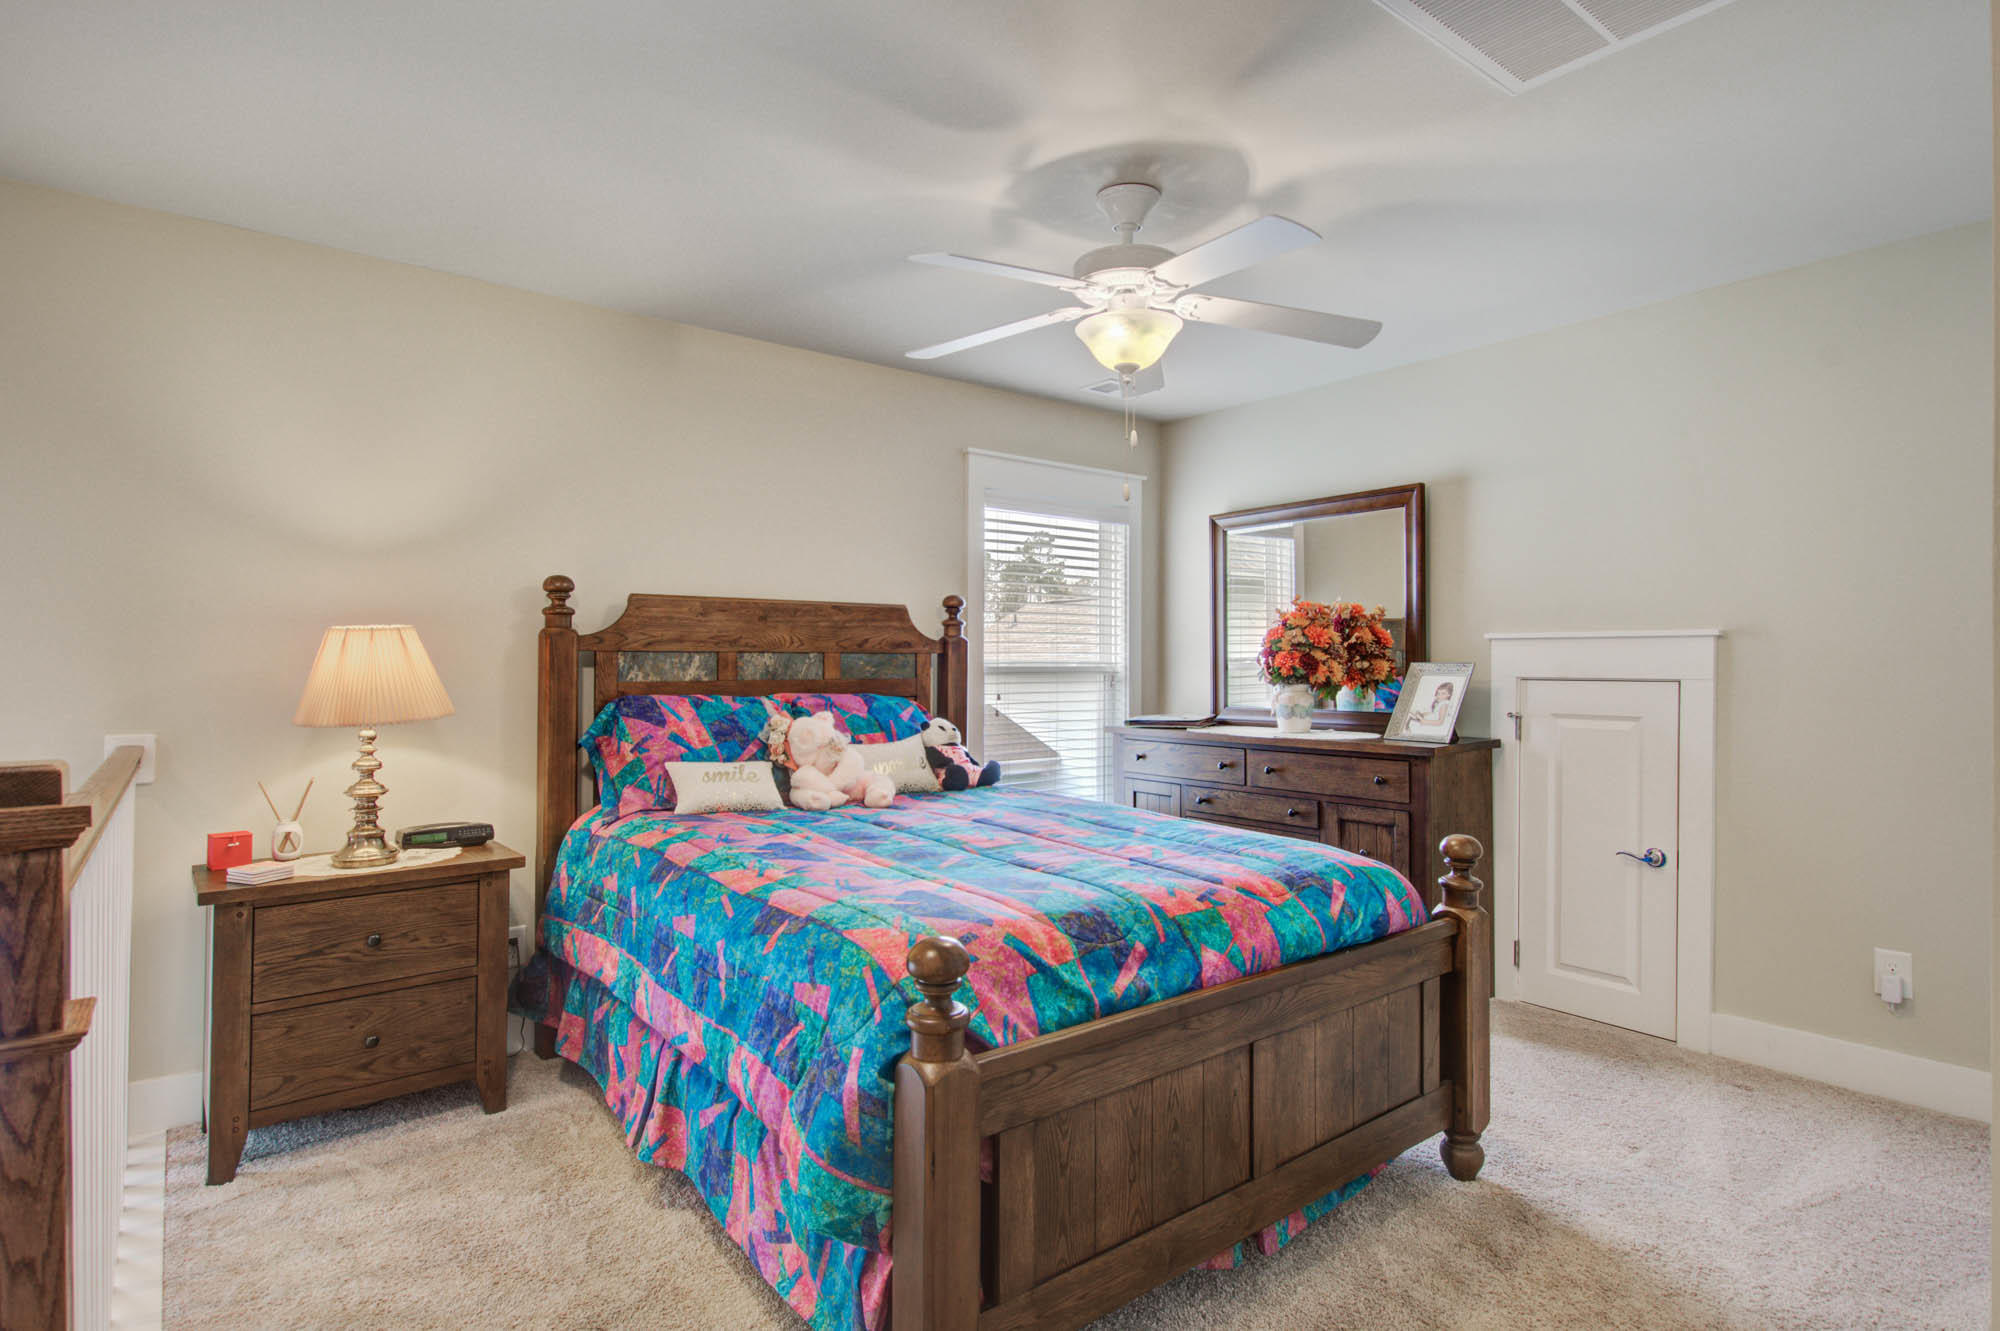 109 Warbler Way Summerville, SC 29483